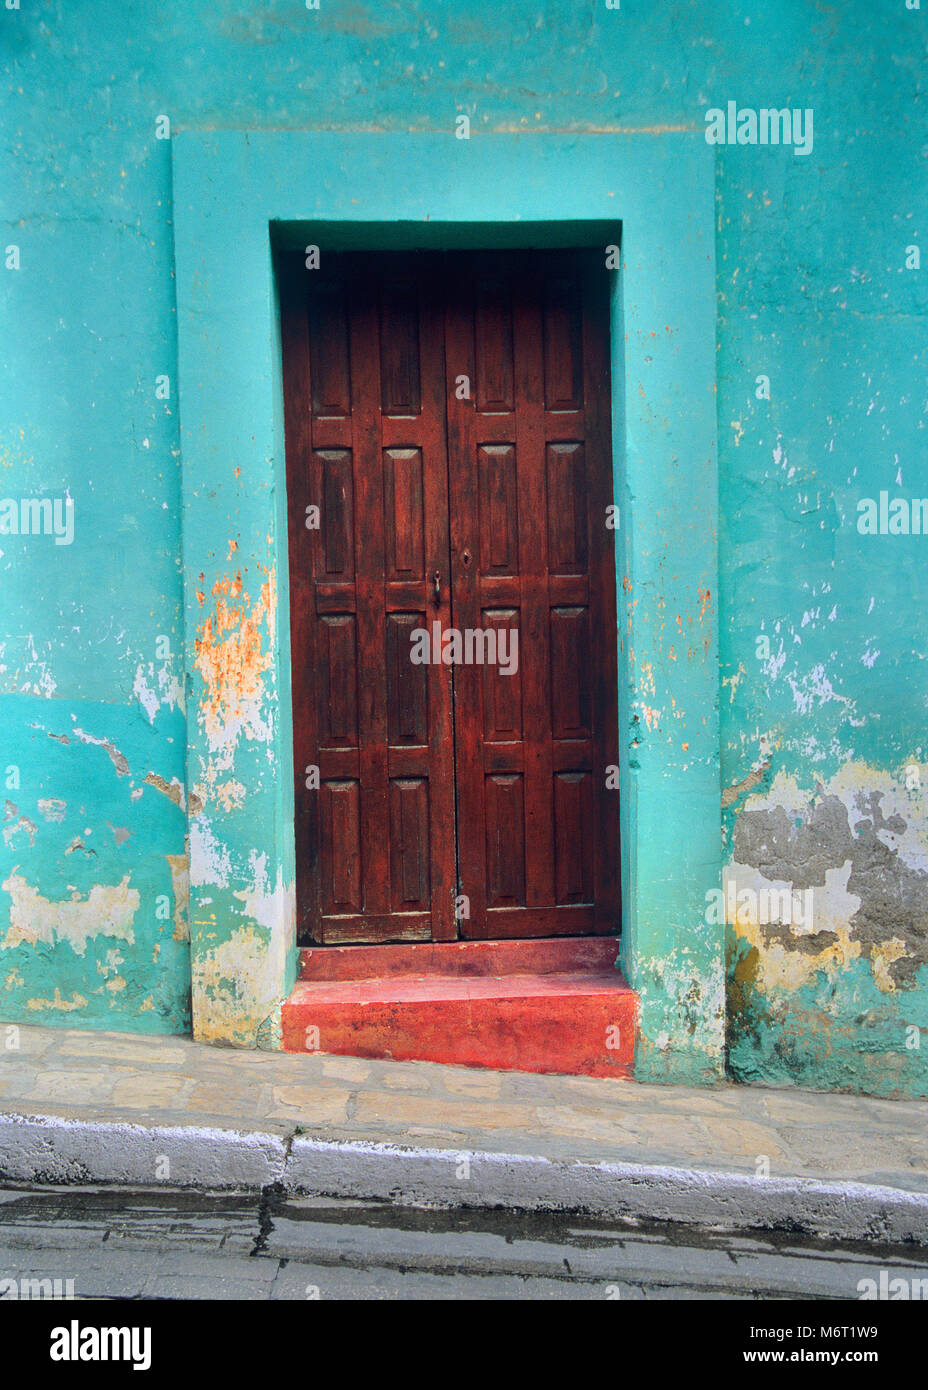 San Cristobol de las Casis is a city in Chiapas, Mexico with colorful doors. Stock Photo